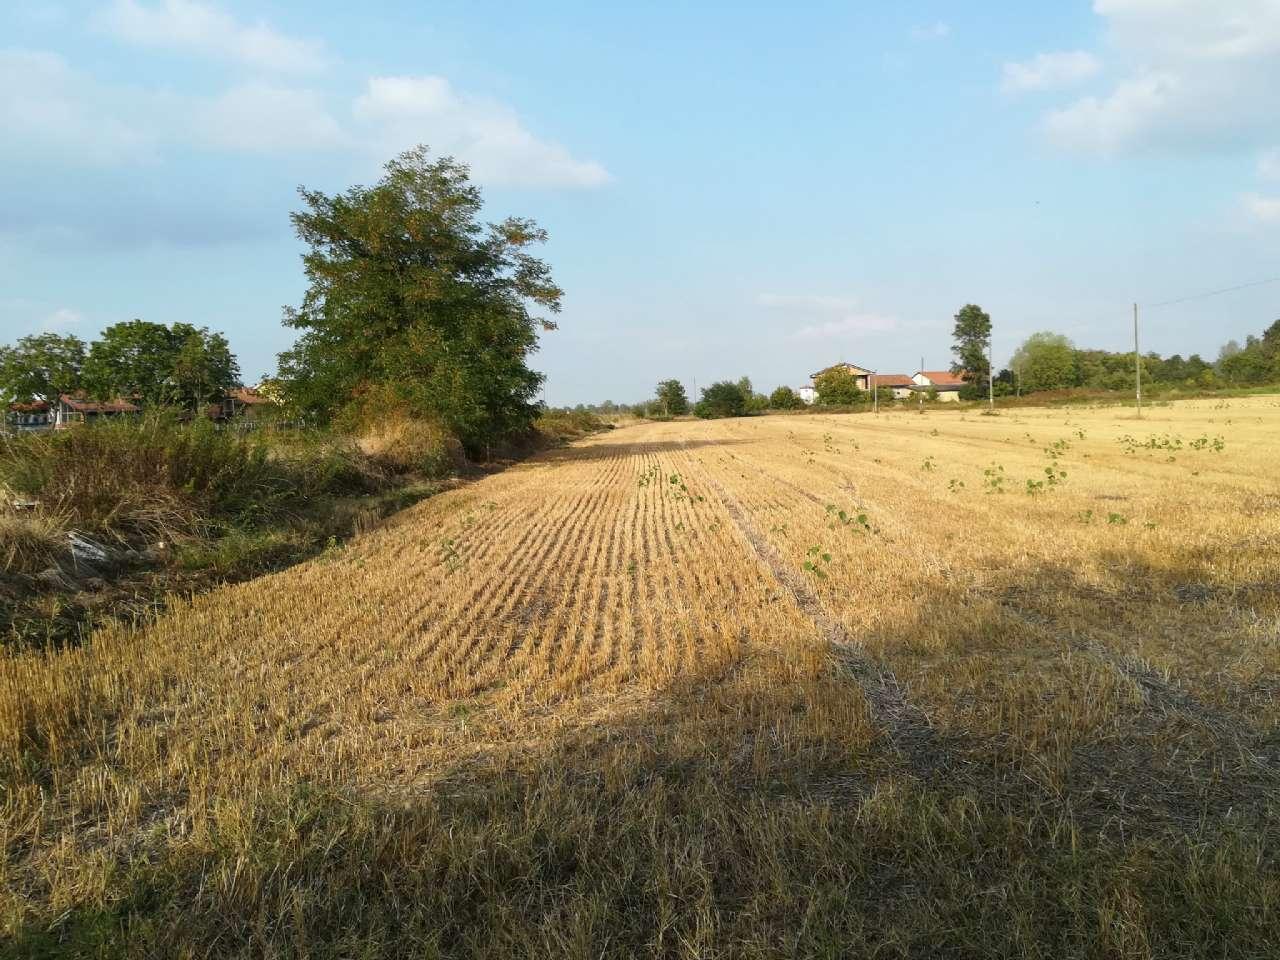 Terreno artigianale - terziario in Vendita a Pianfei